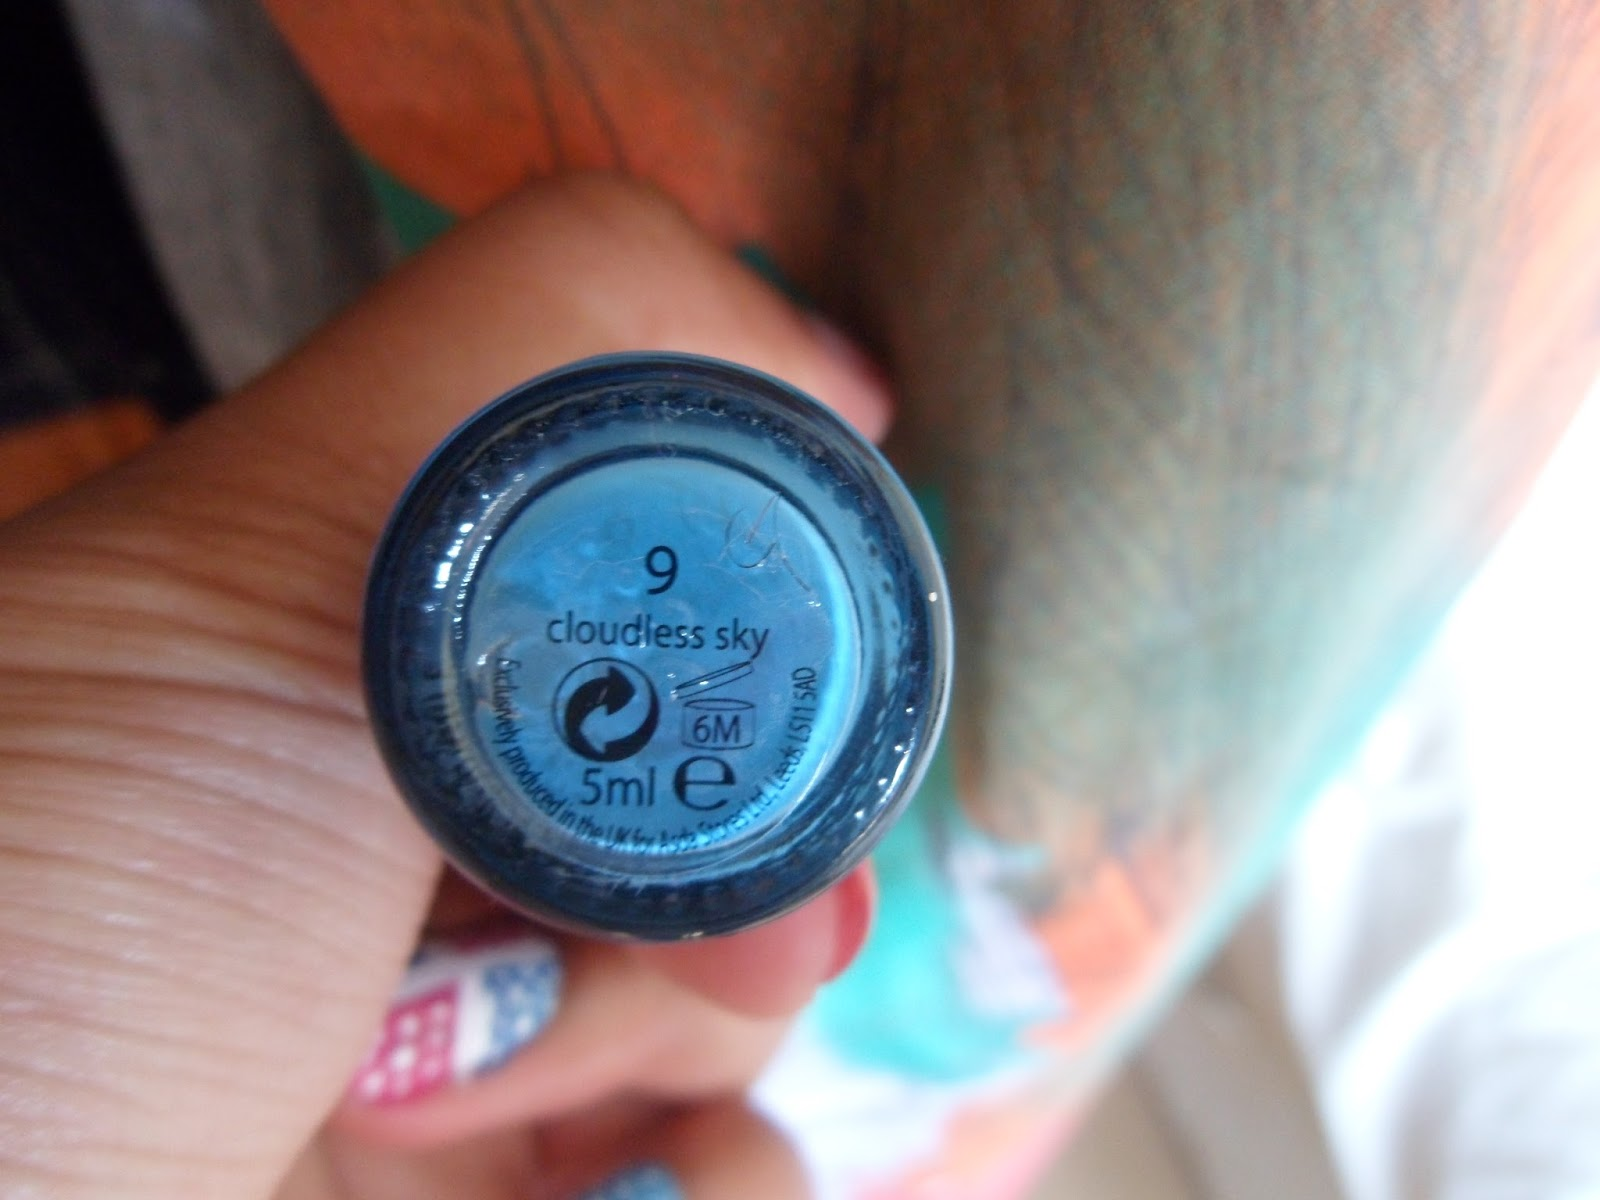 Nail Art Pens Asda - To Bend Light